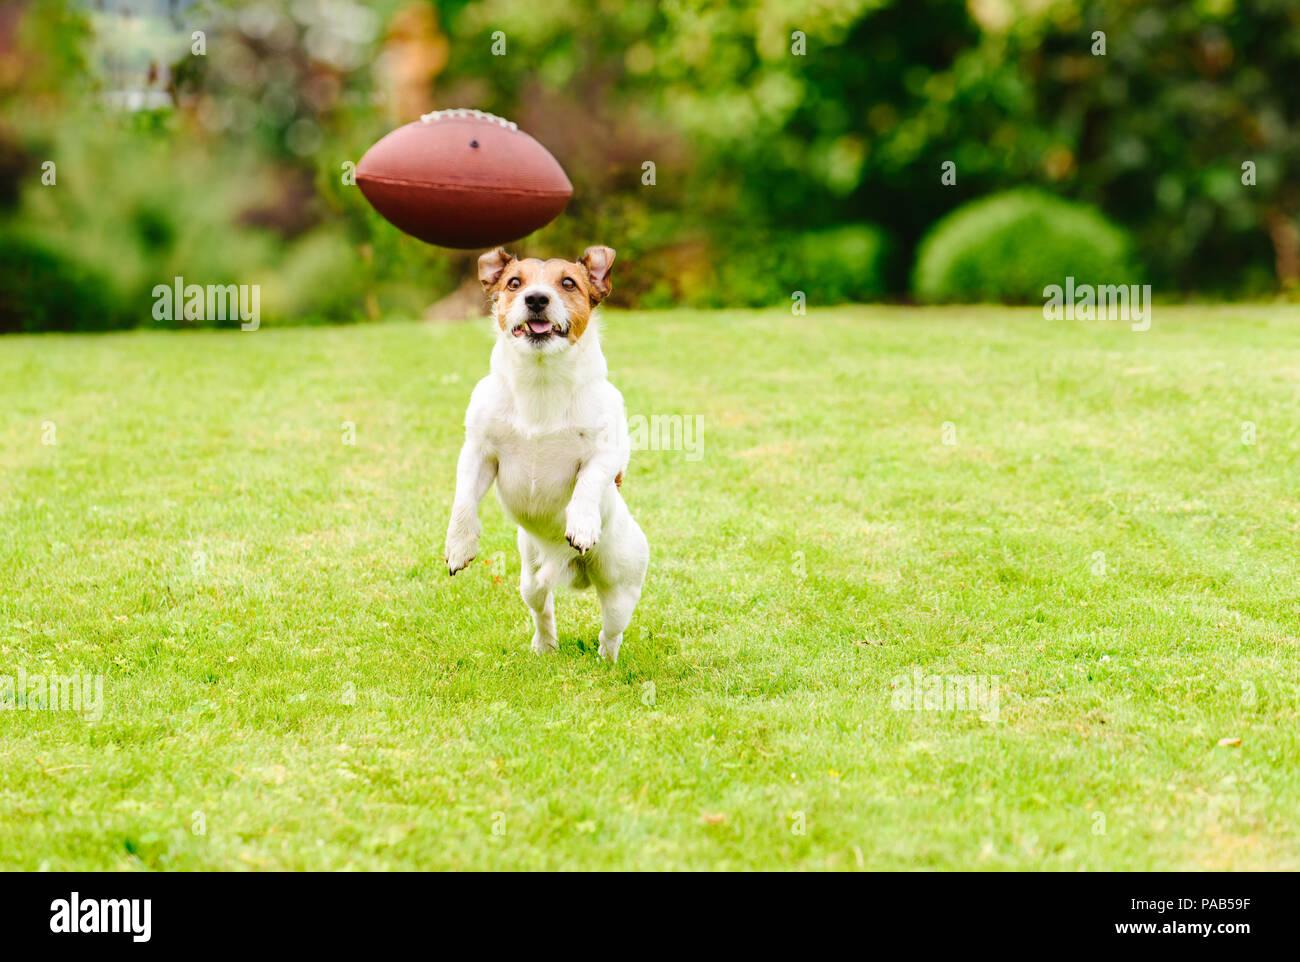 Funny dog playing with american football ball at backyard lawn - Stock Image